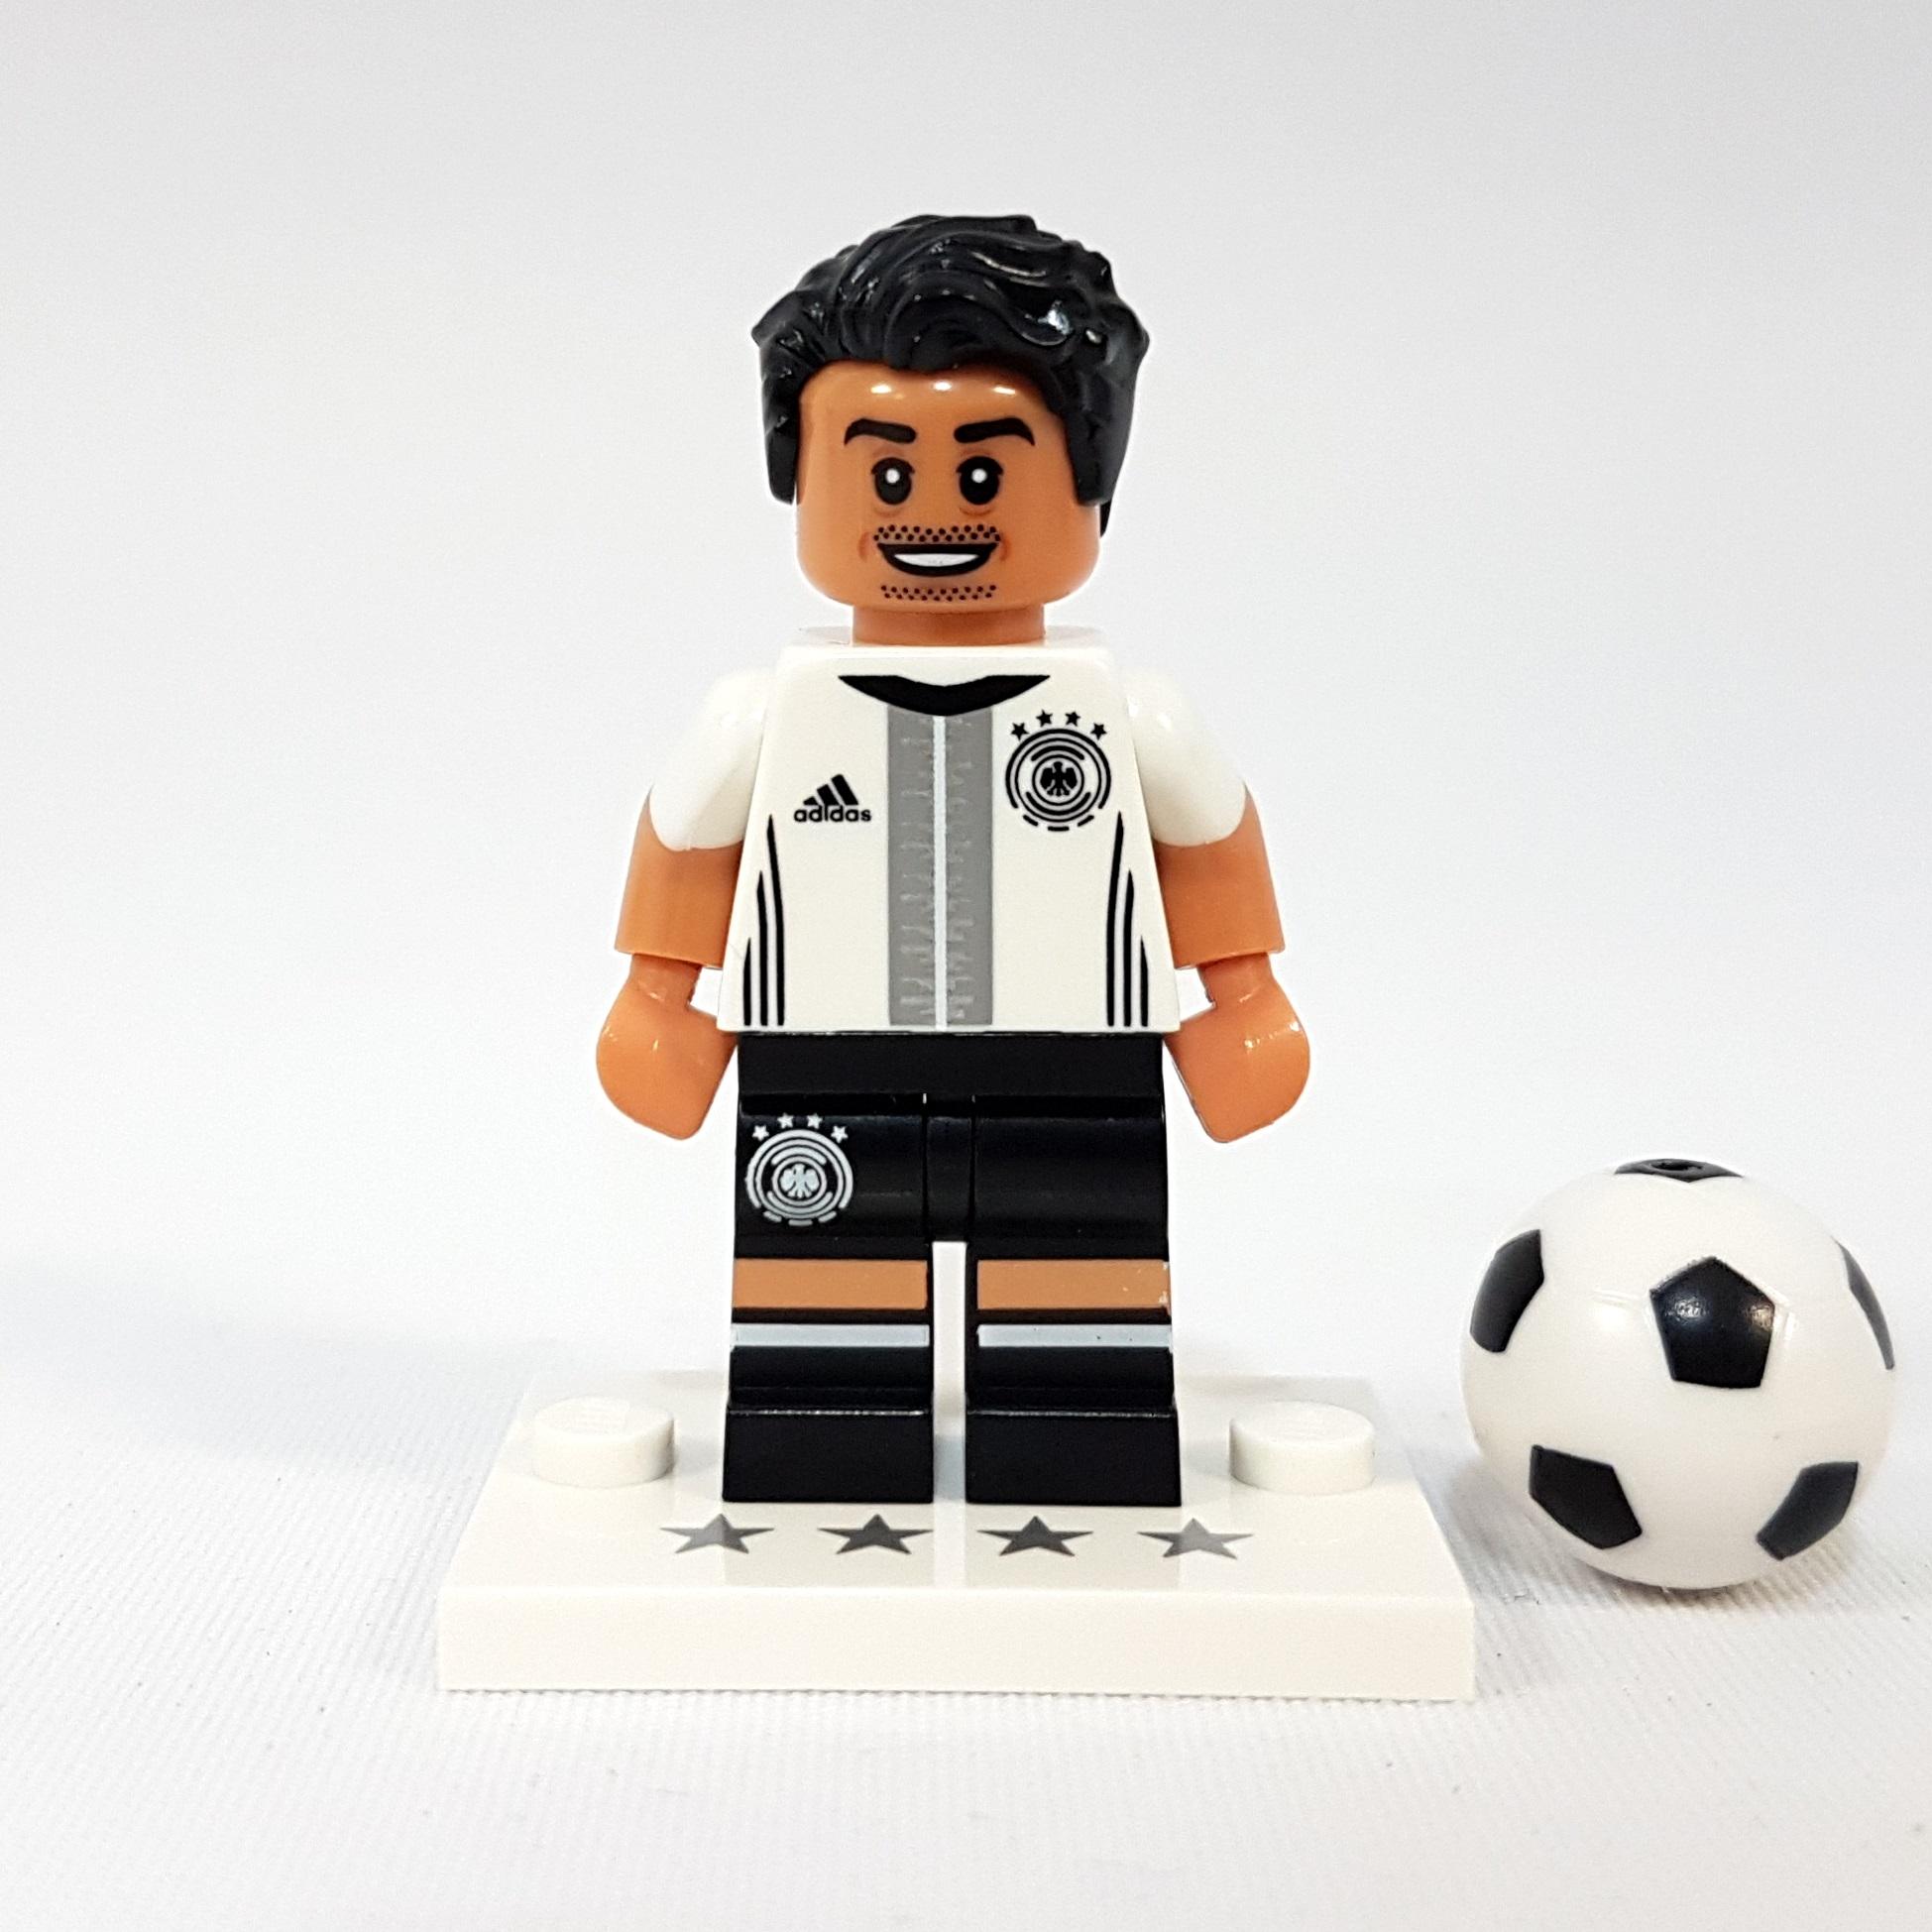 Lego Dfb MiniFiguren Beipackzettel weißer Platte Fussball Christoph Kramer Nr.20